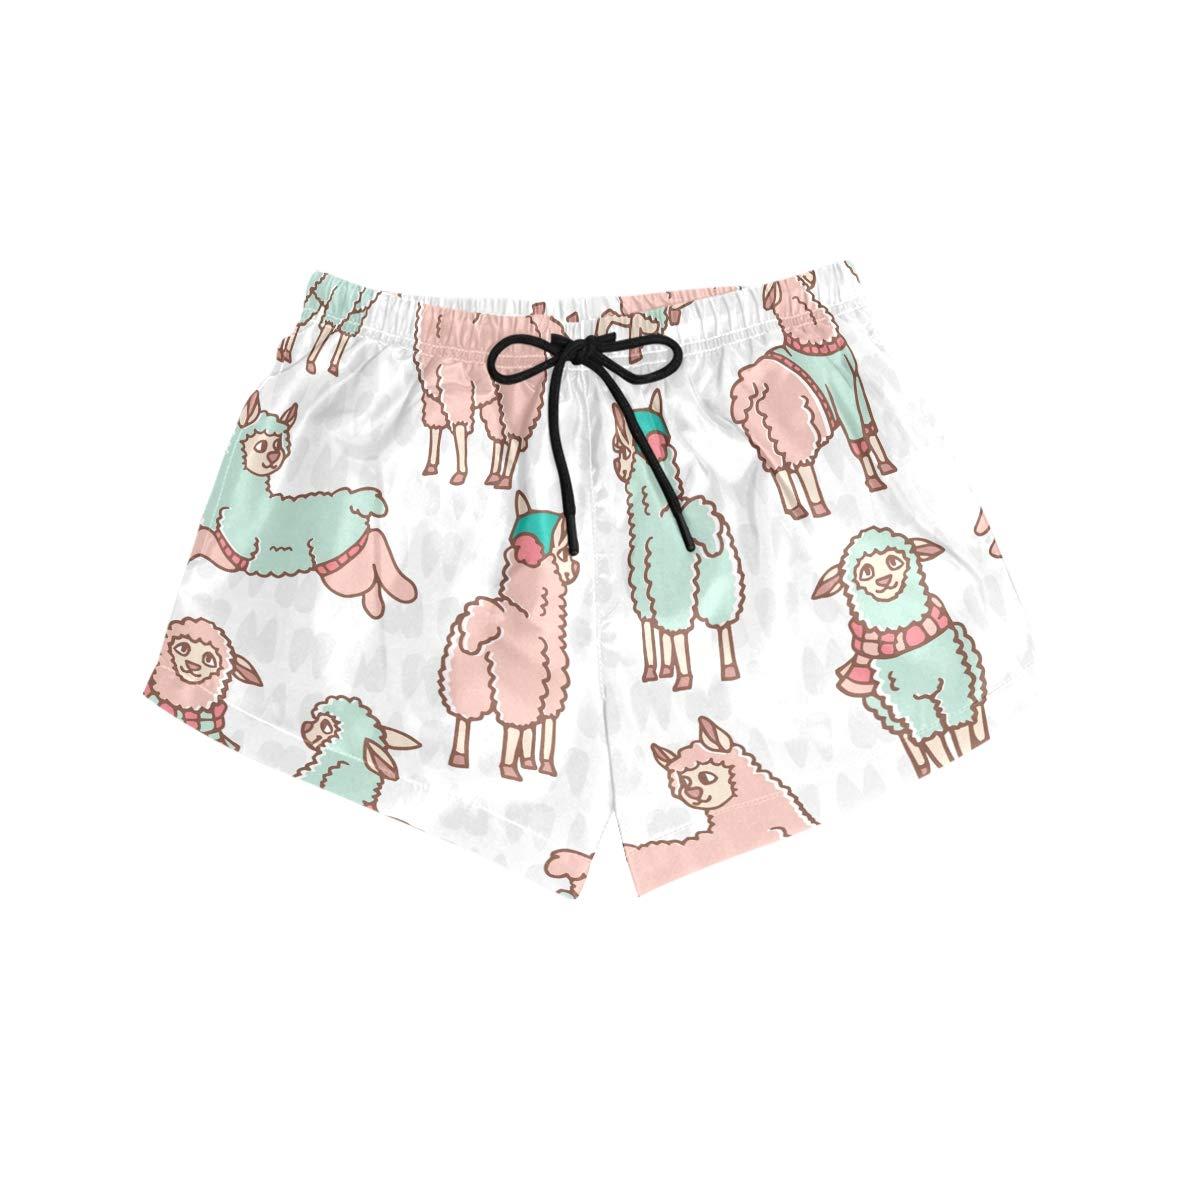 FORMRS Womens Swim Colors Cartoon Alpaca Board Shorts Bottom Beach Short Trunk Swimwear with Drawstring